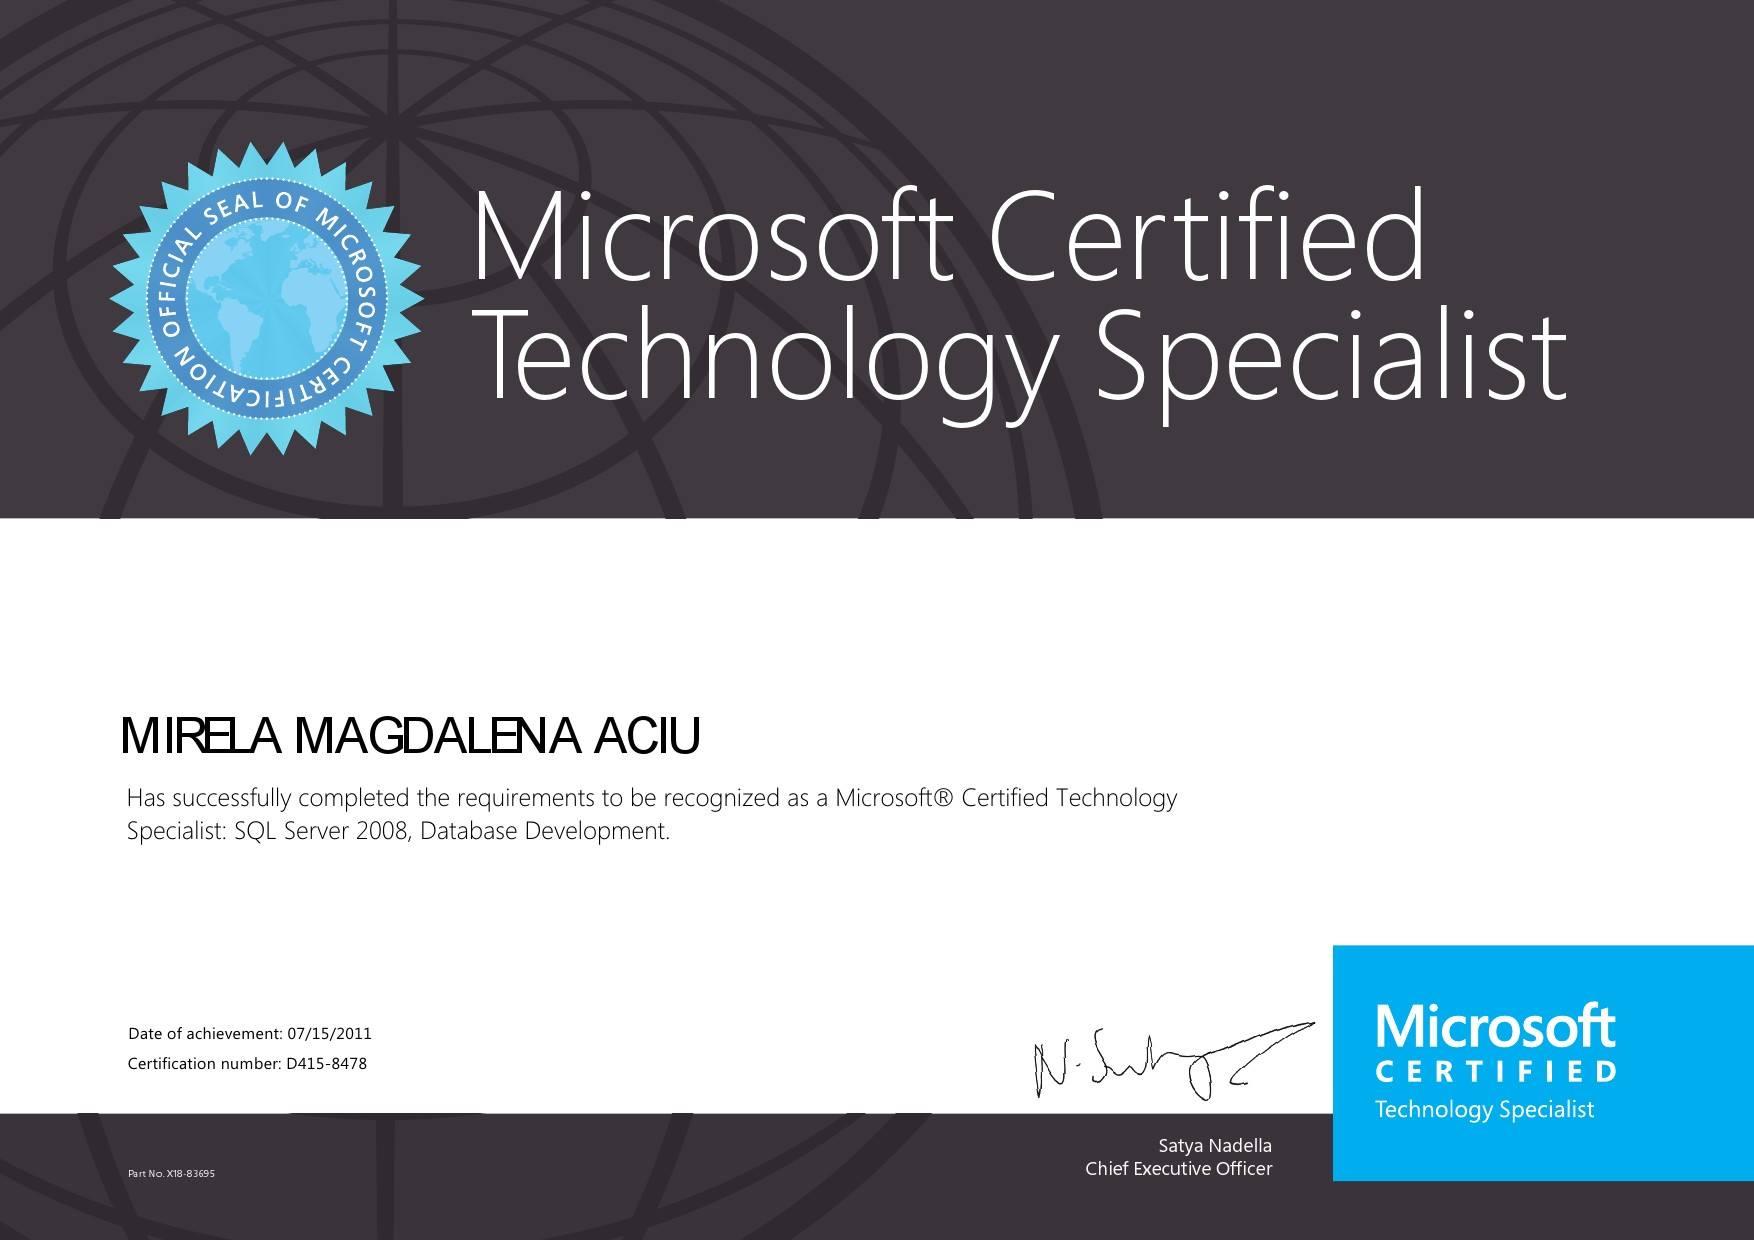 MIRELA MAGDALENA ACIU - Specialist: SQL Server 2008, Database Development.